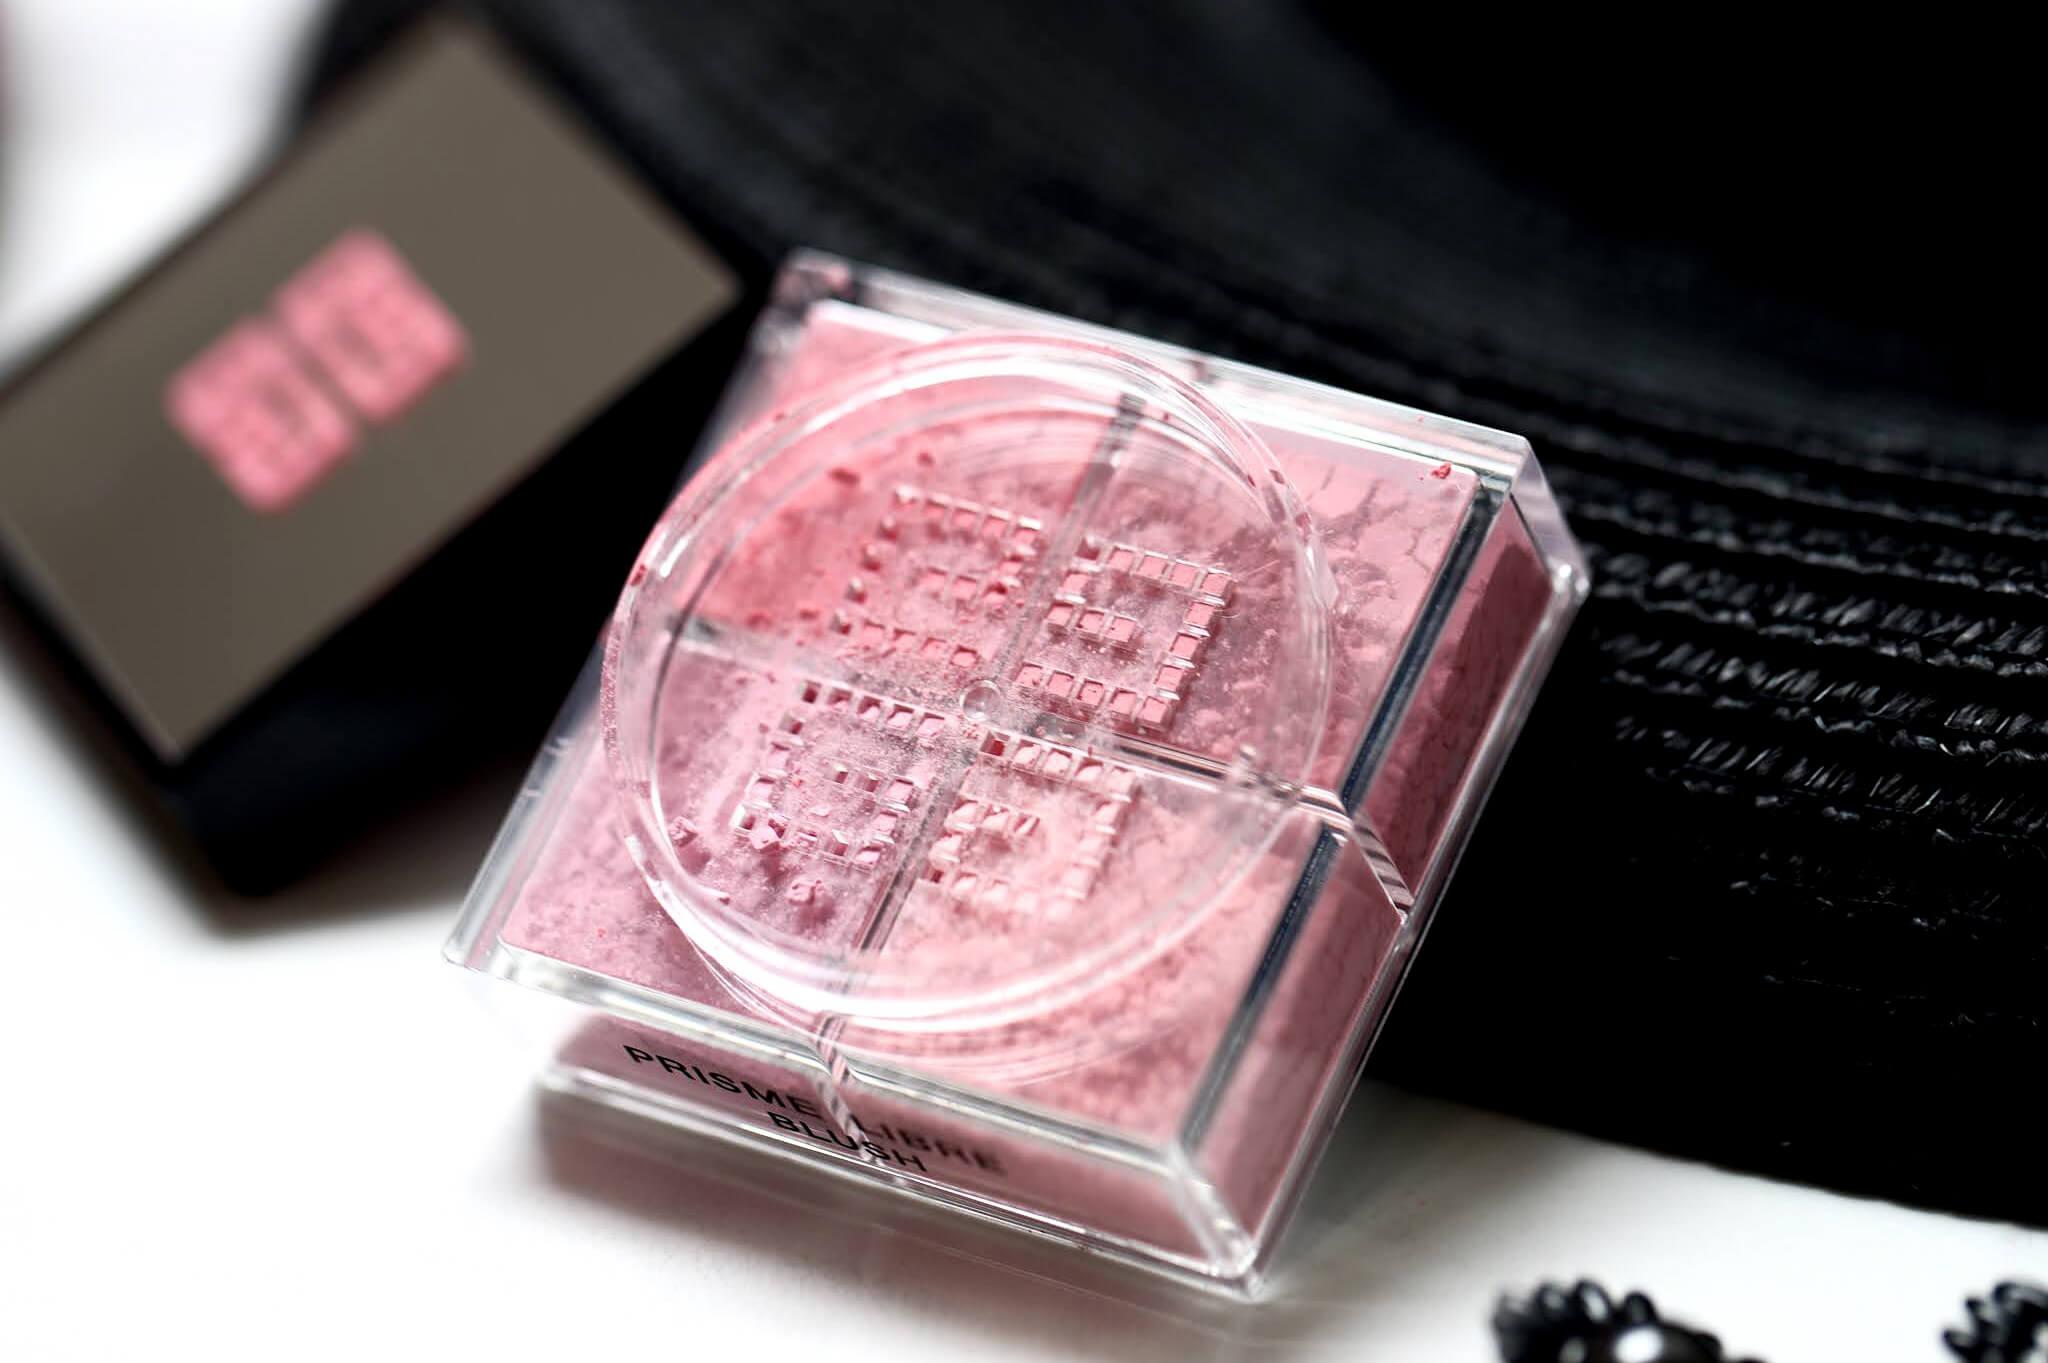 givenchy prisme libre blush 2 taffetas rosé